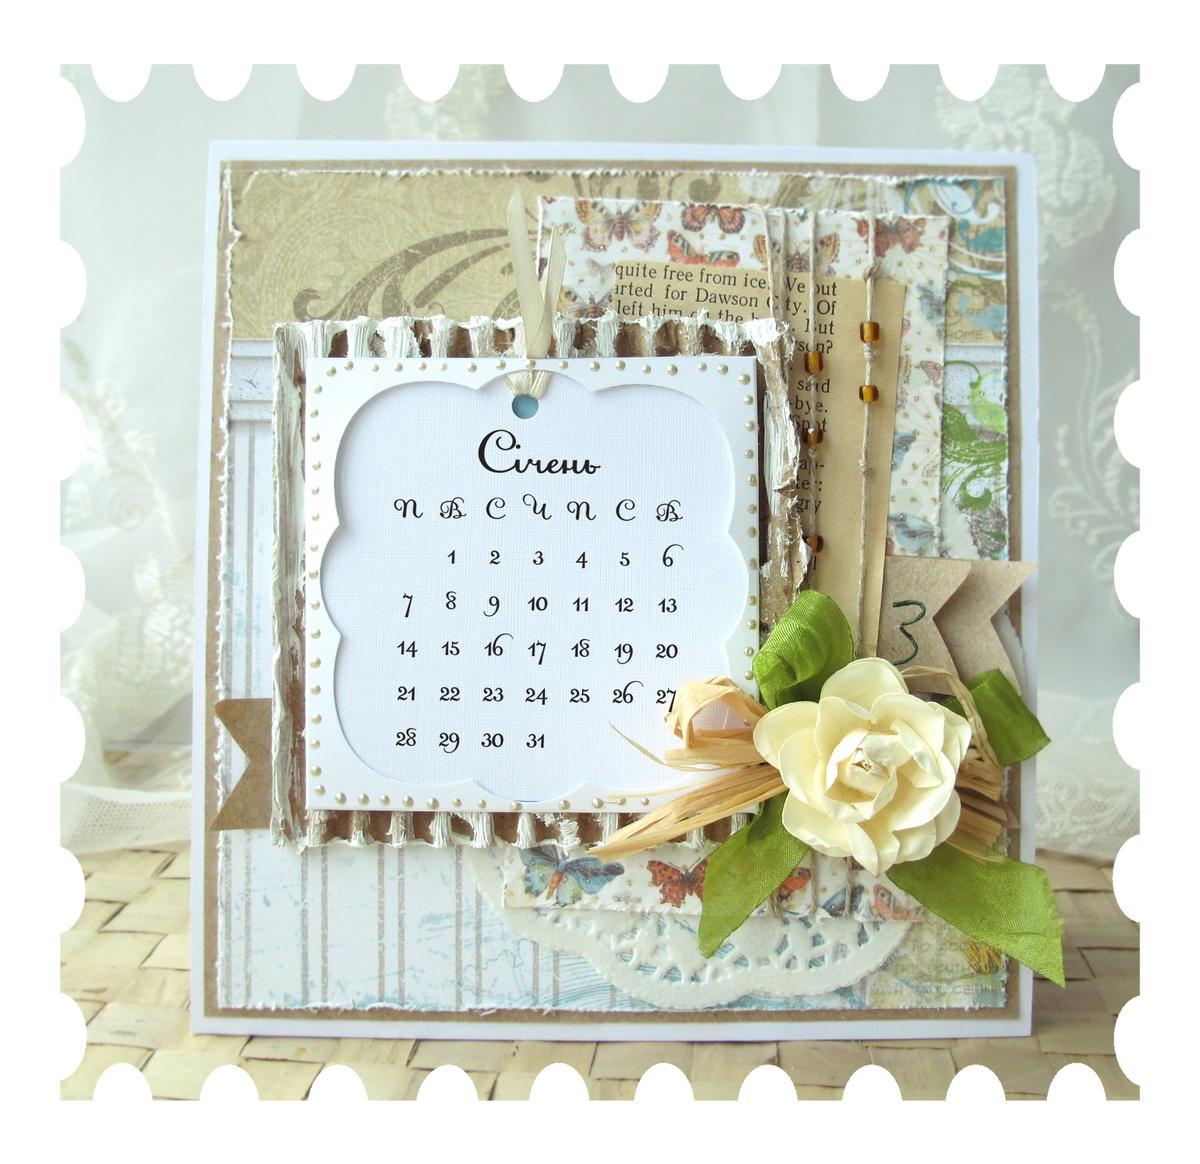 Картинки надписями, календари открытки это